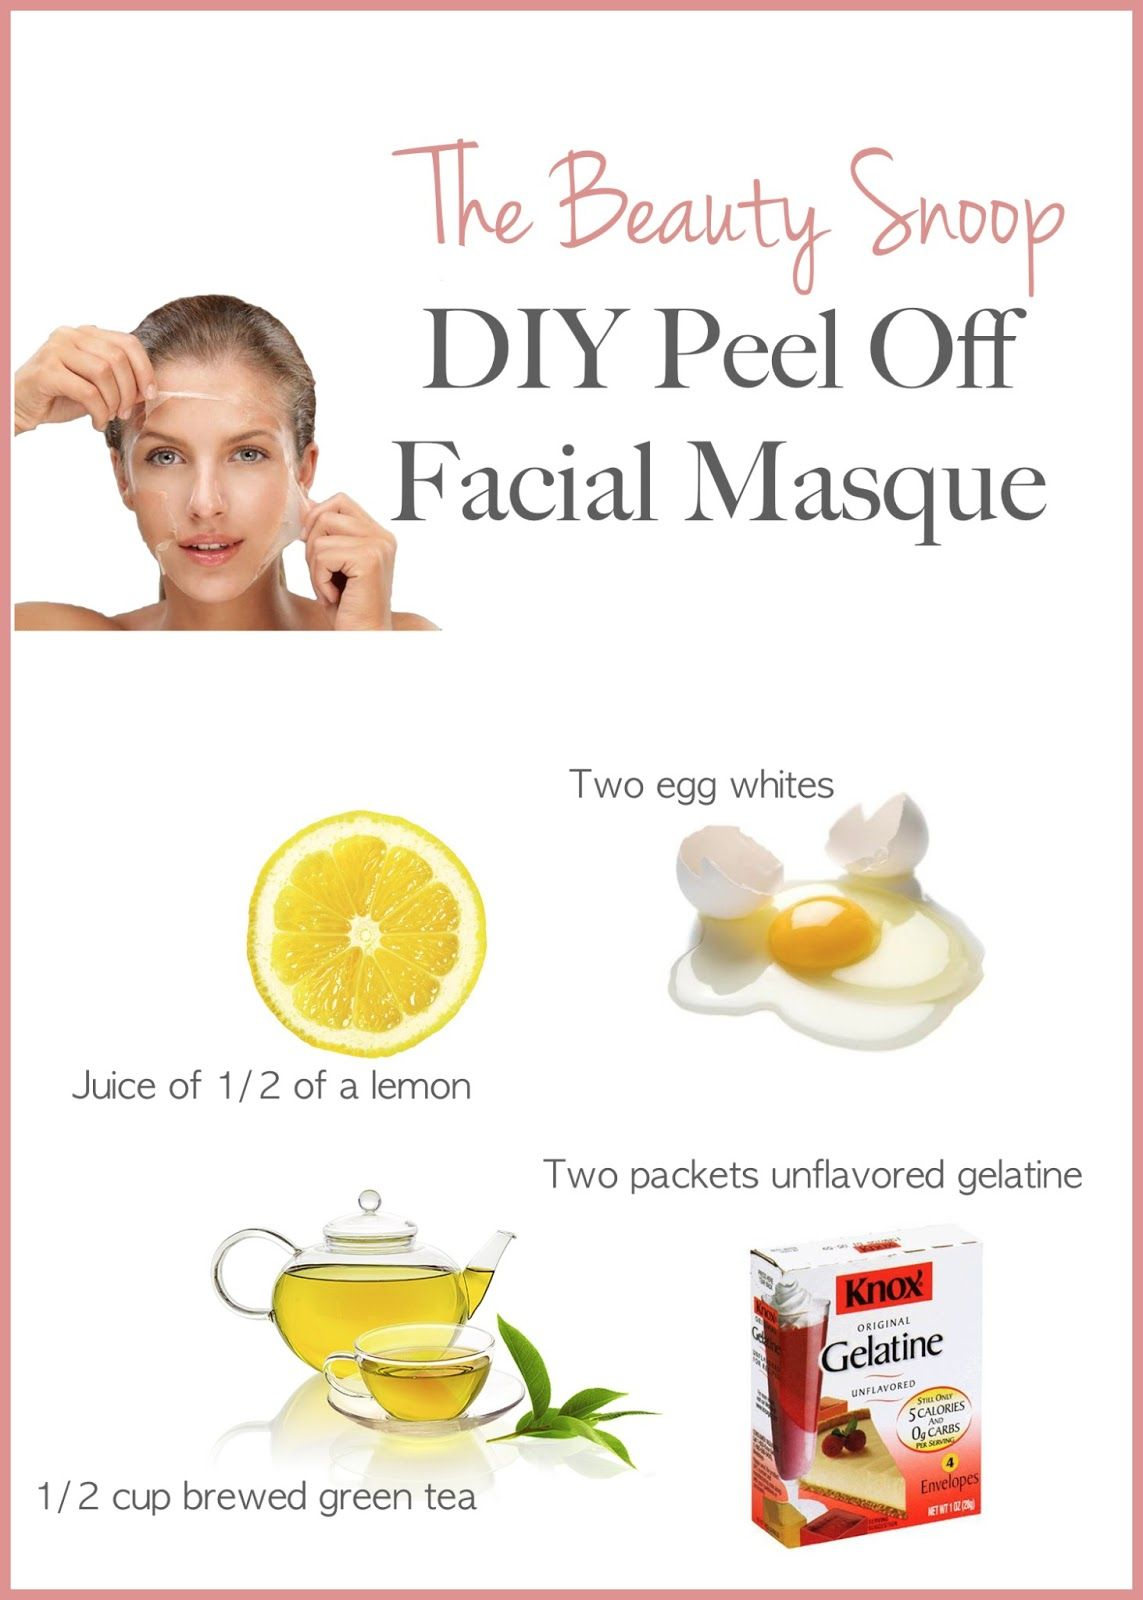 Diy Peel Off Detox Facial Masque Healthy Beautiful Me Pinterest